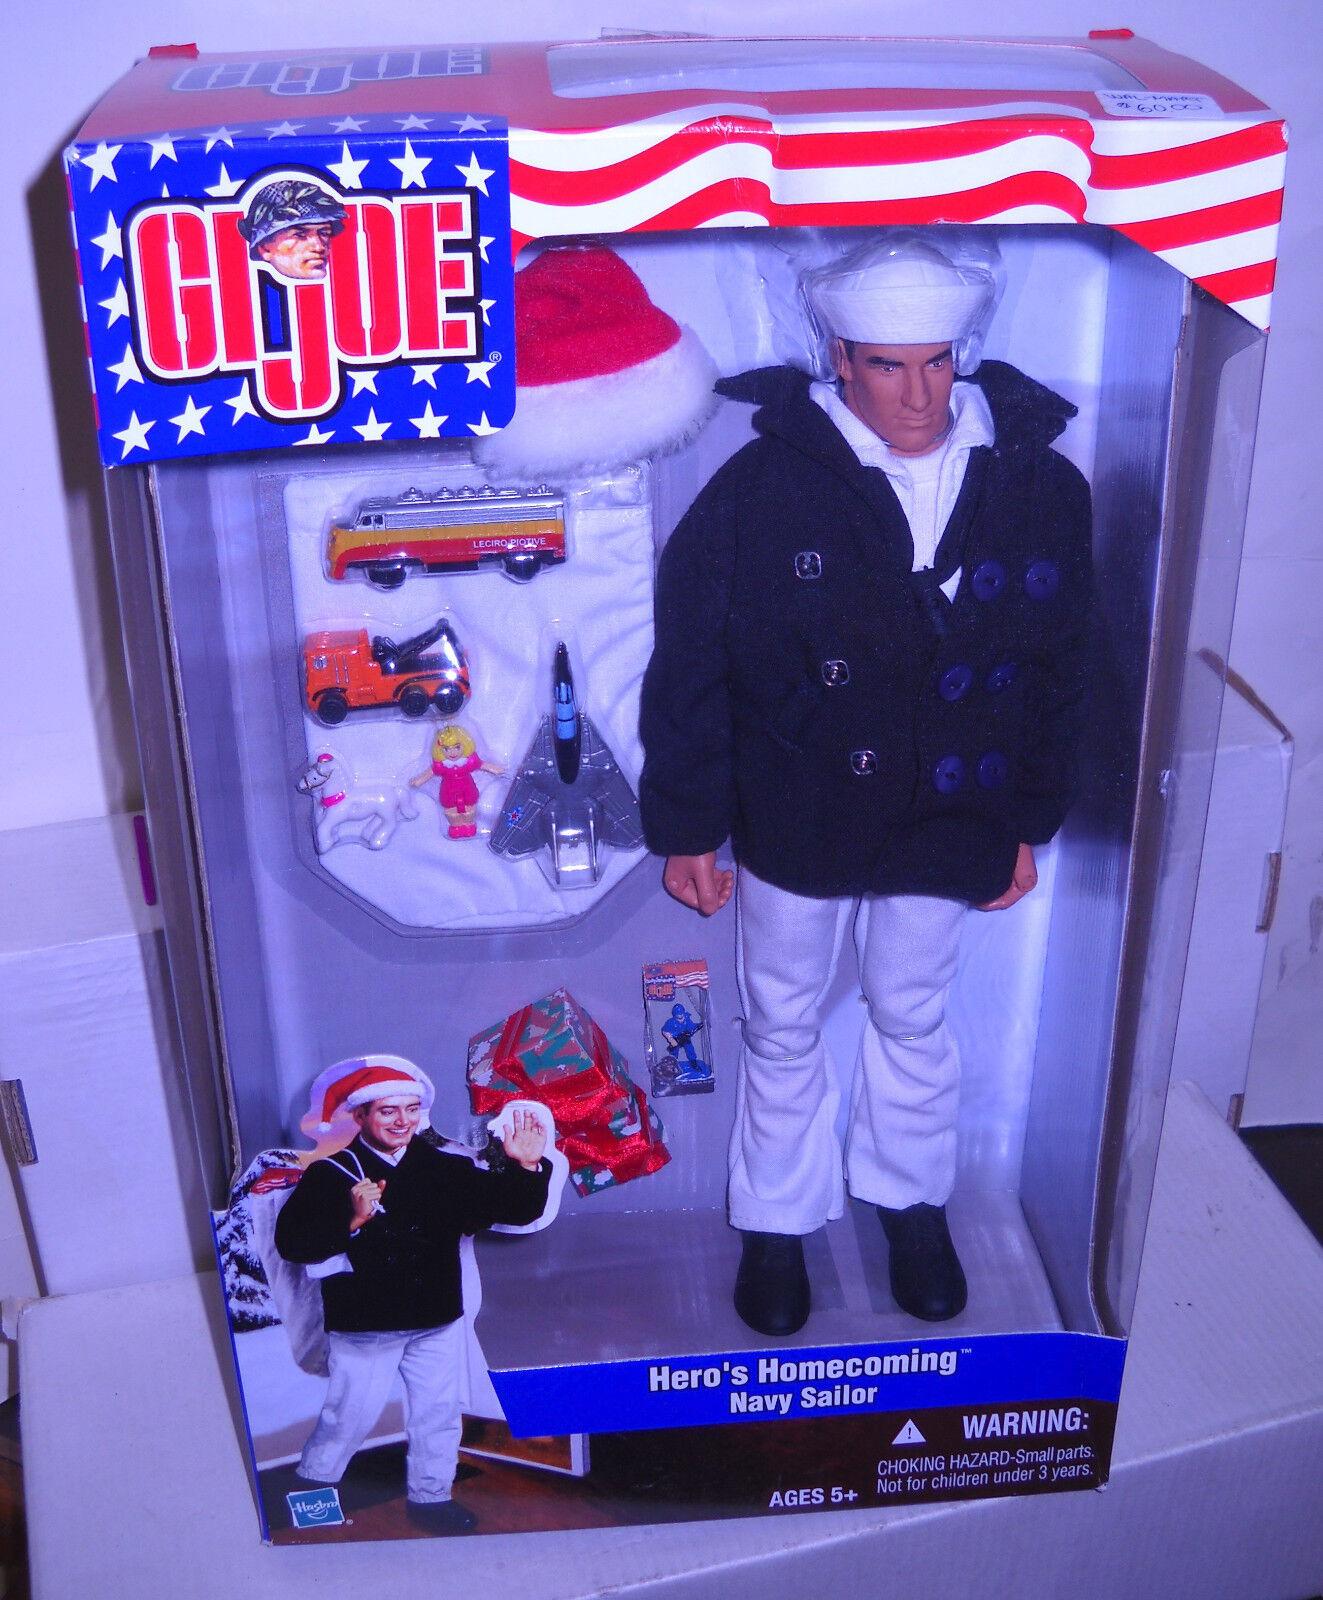 NRFB Hasbro GI Joe Hero's Homecoming Navy Sailor